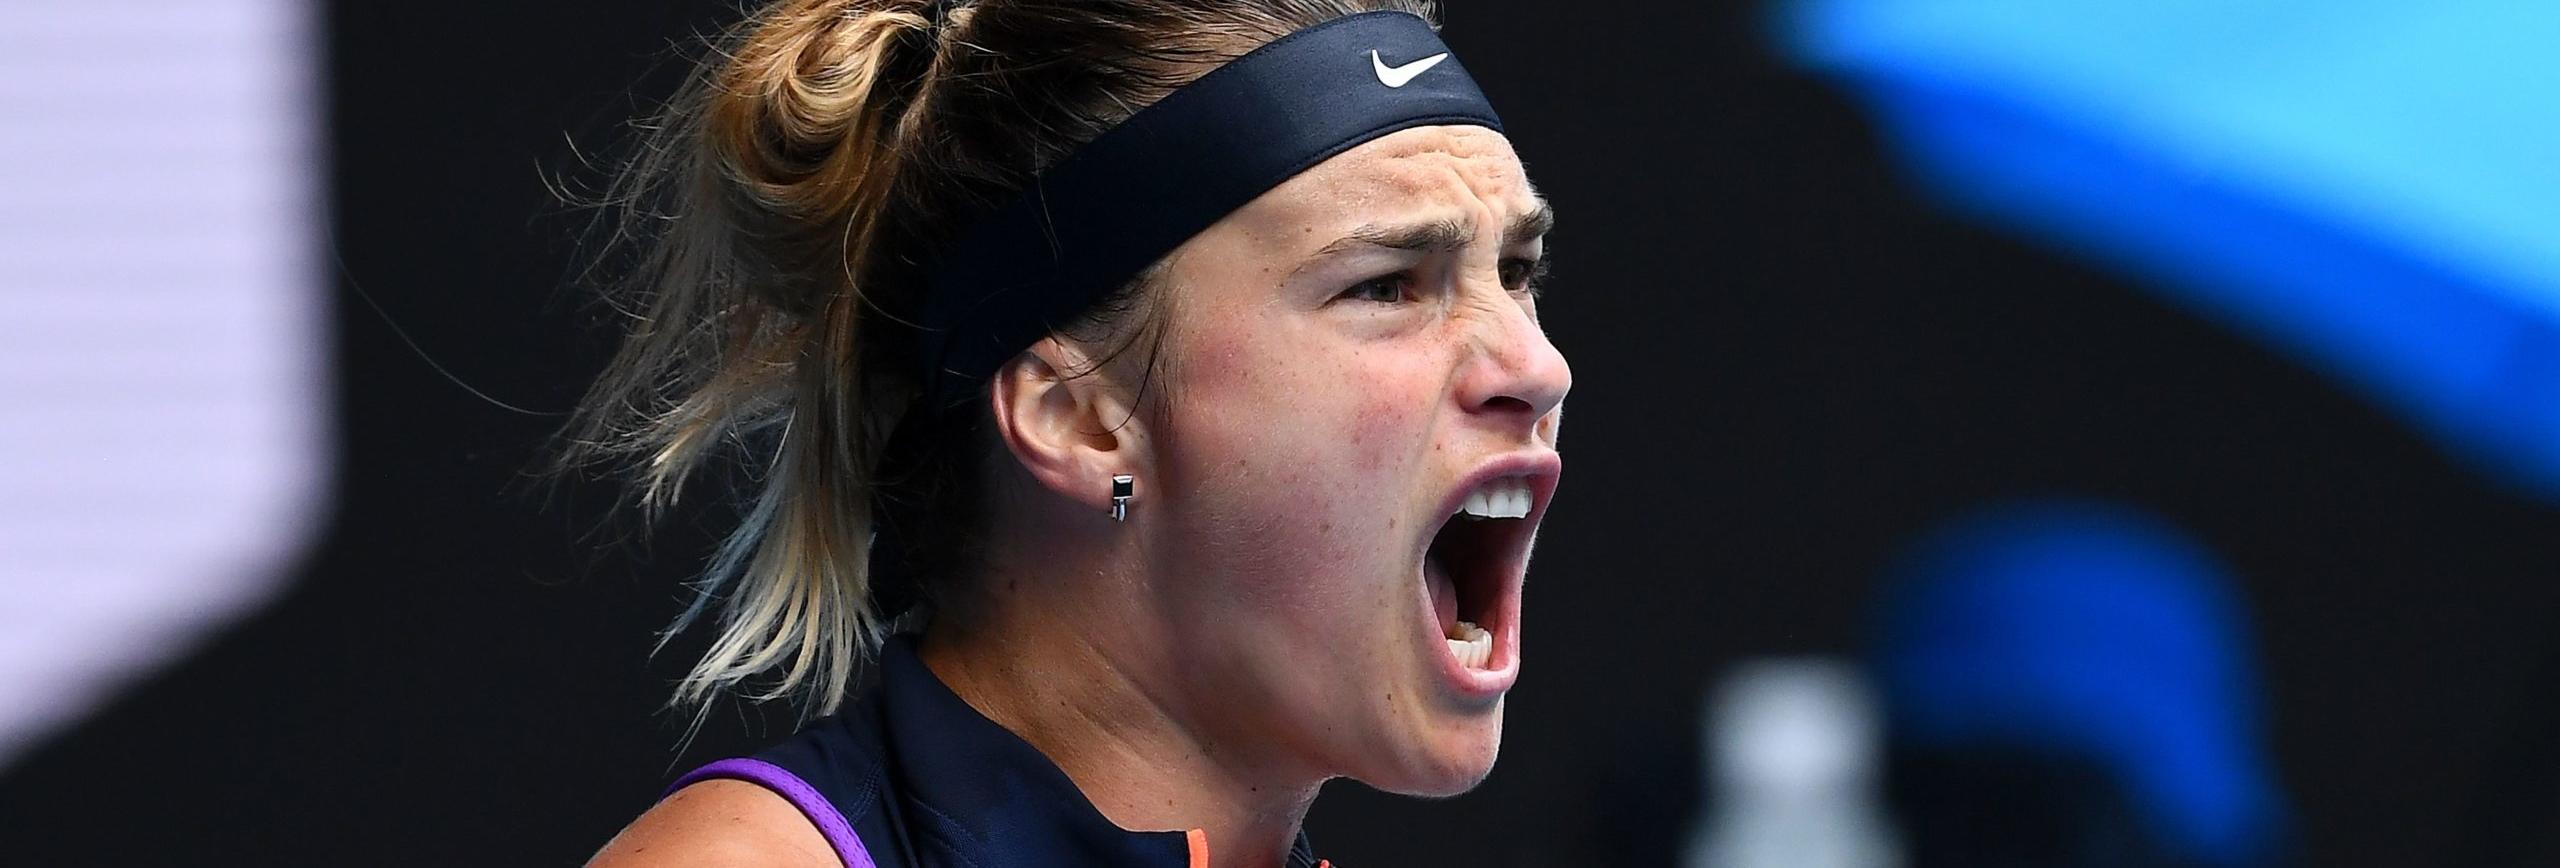 Pronostici Australian Open - i dubbi su Nole, Sabalenka pronta a battere Williams e Swiatek-Halep da non perdere